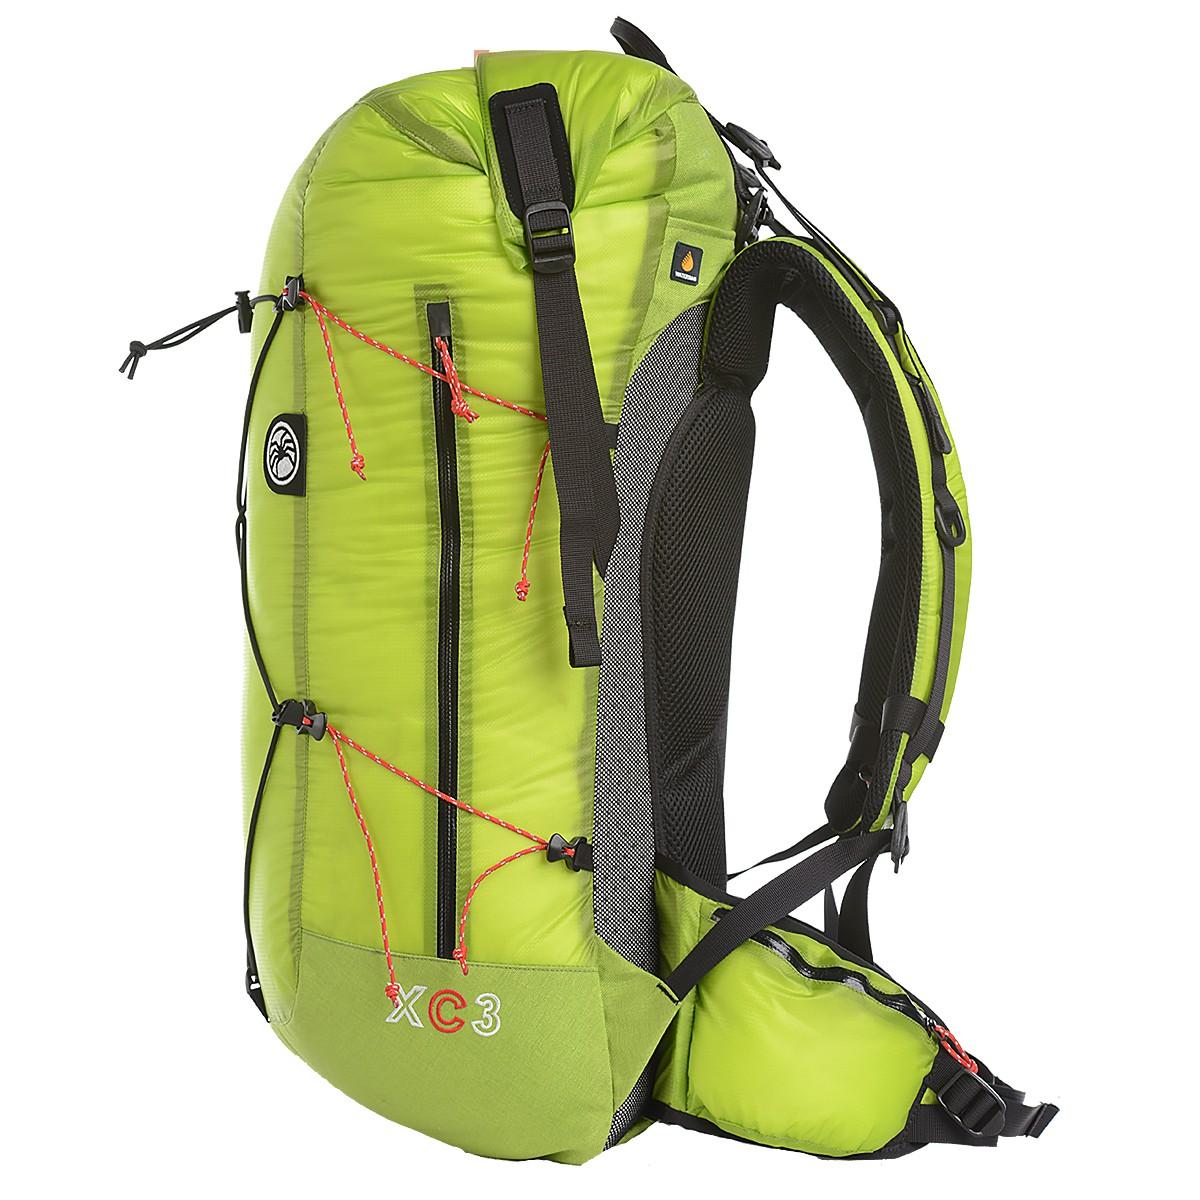 63594ea04854a Pajak XC3 ultralekki i duży plecak turystyczny 42l Cordura